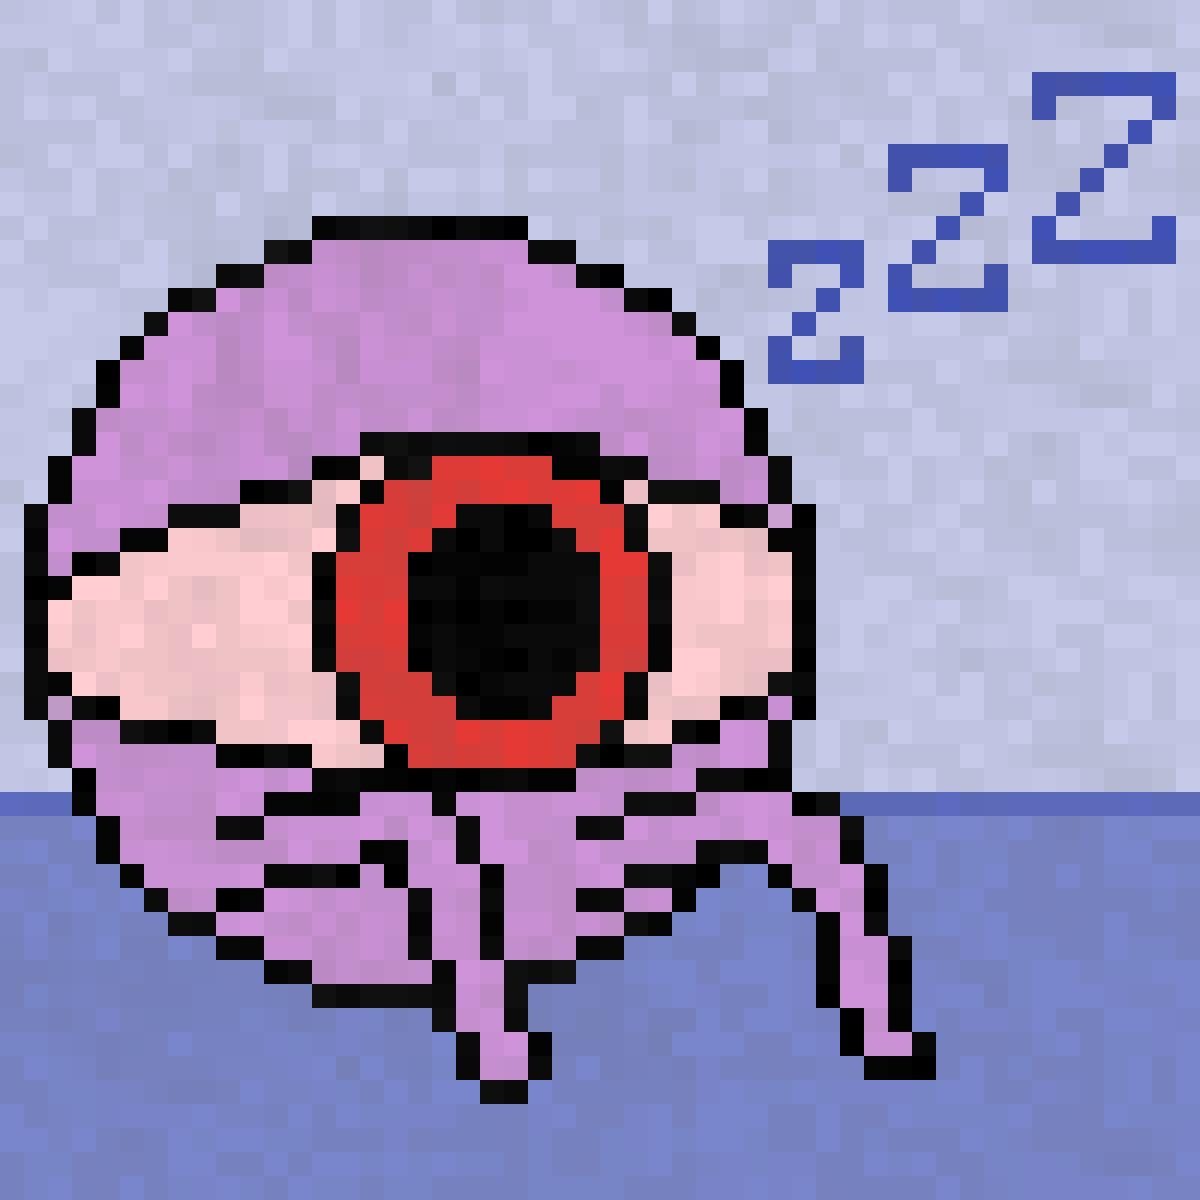 Sleepy eye by Hmusqe